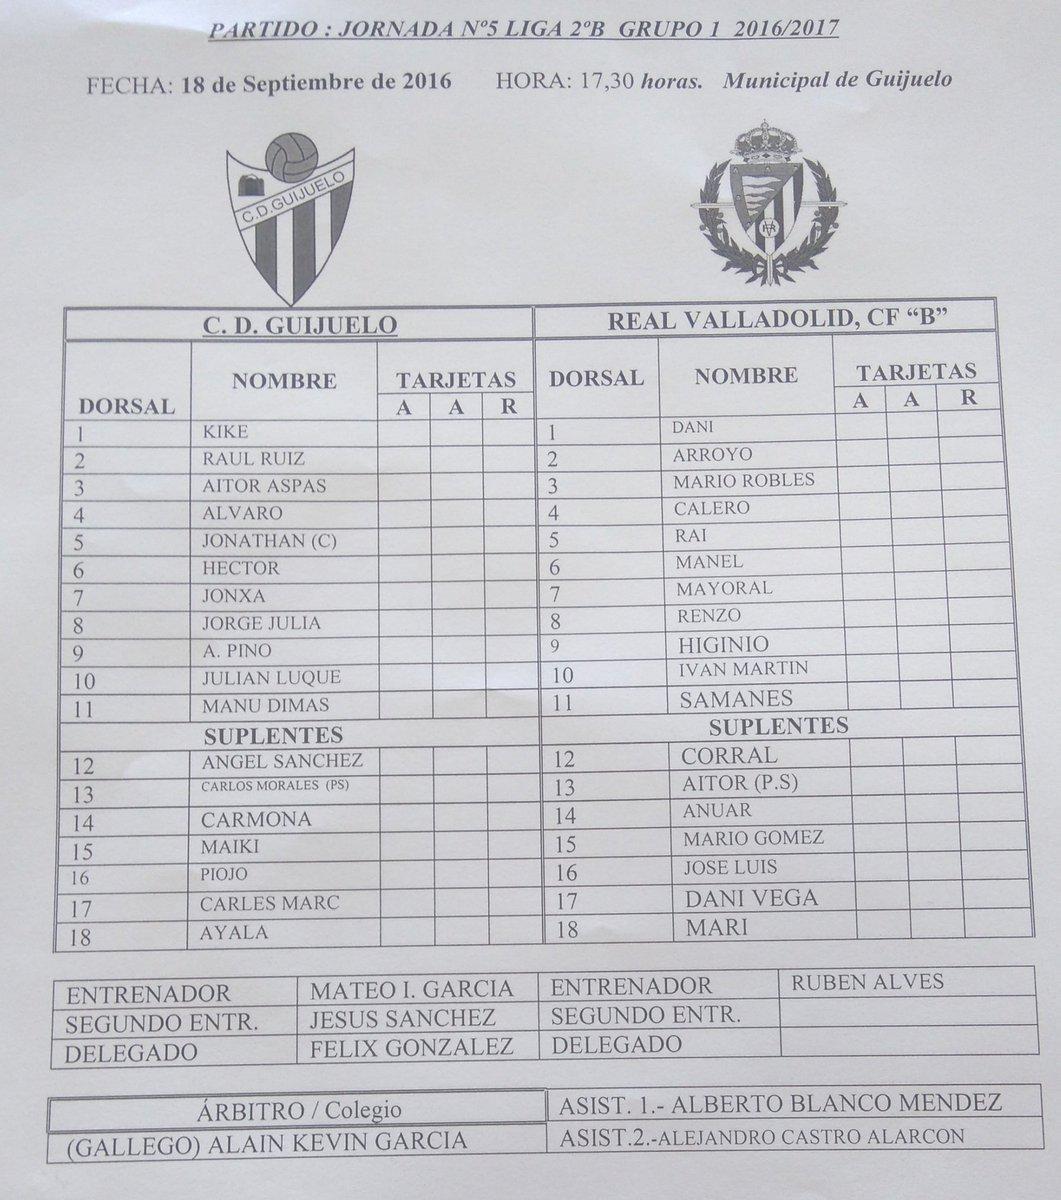 Real Valladolid B - Temporada 2016/17 - 2ª División B Grupo I - Página 5 CspS6x4WEAAt-6O